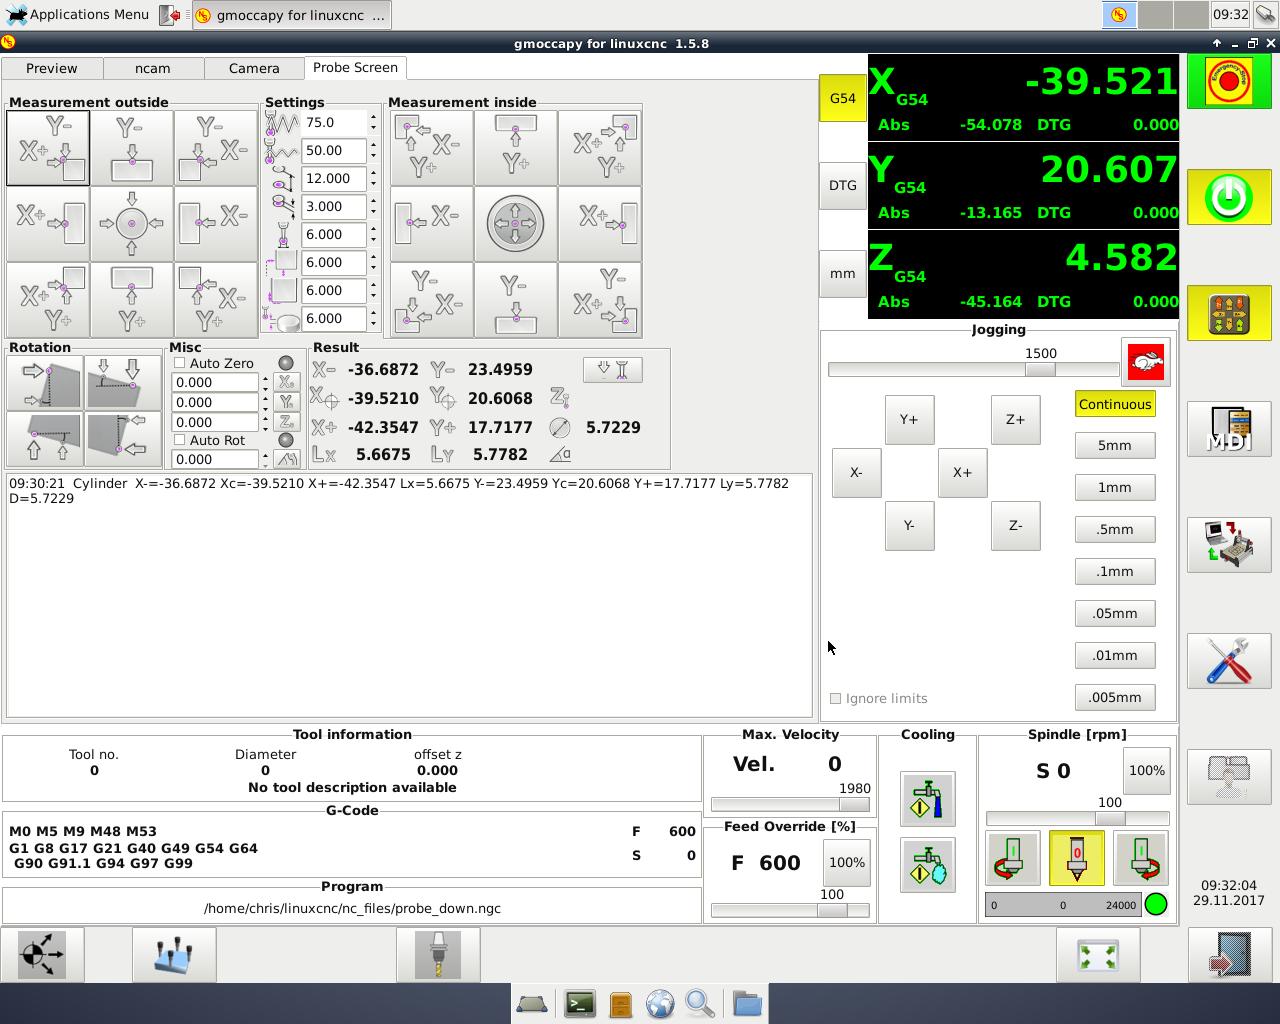 Screenshot-291117-093207.png